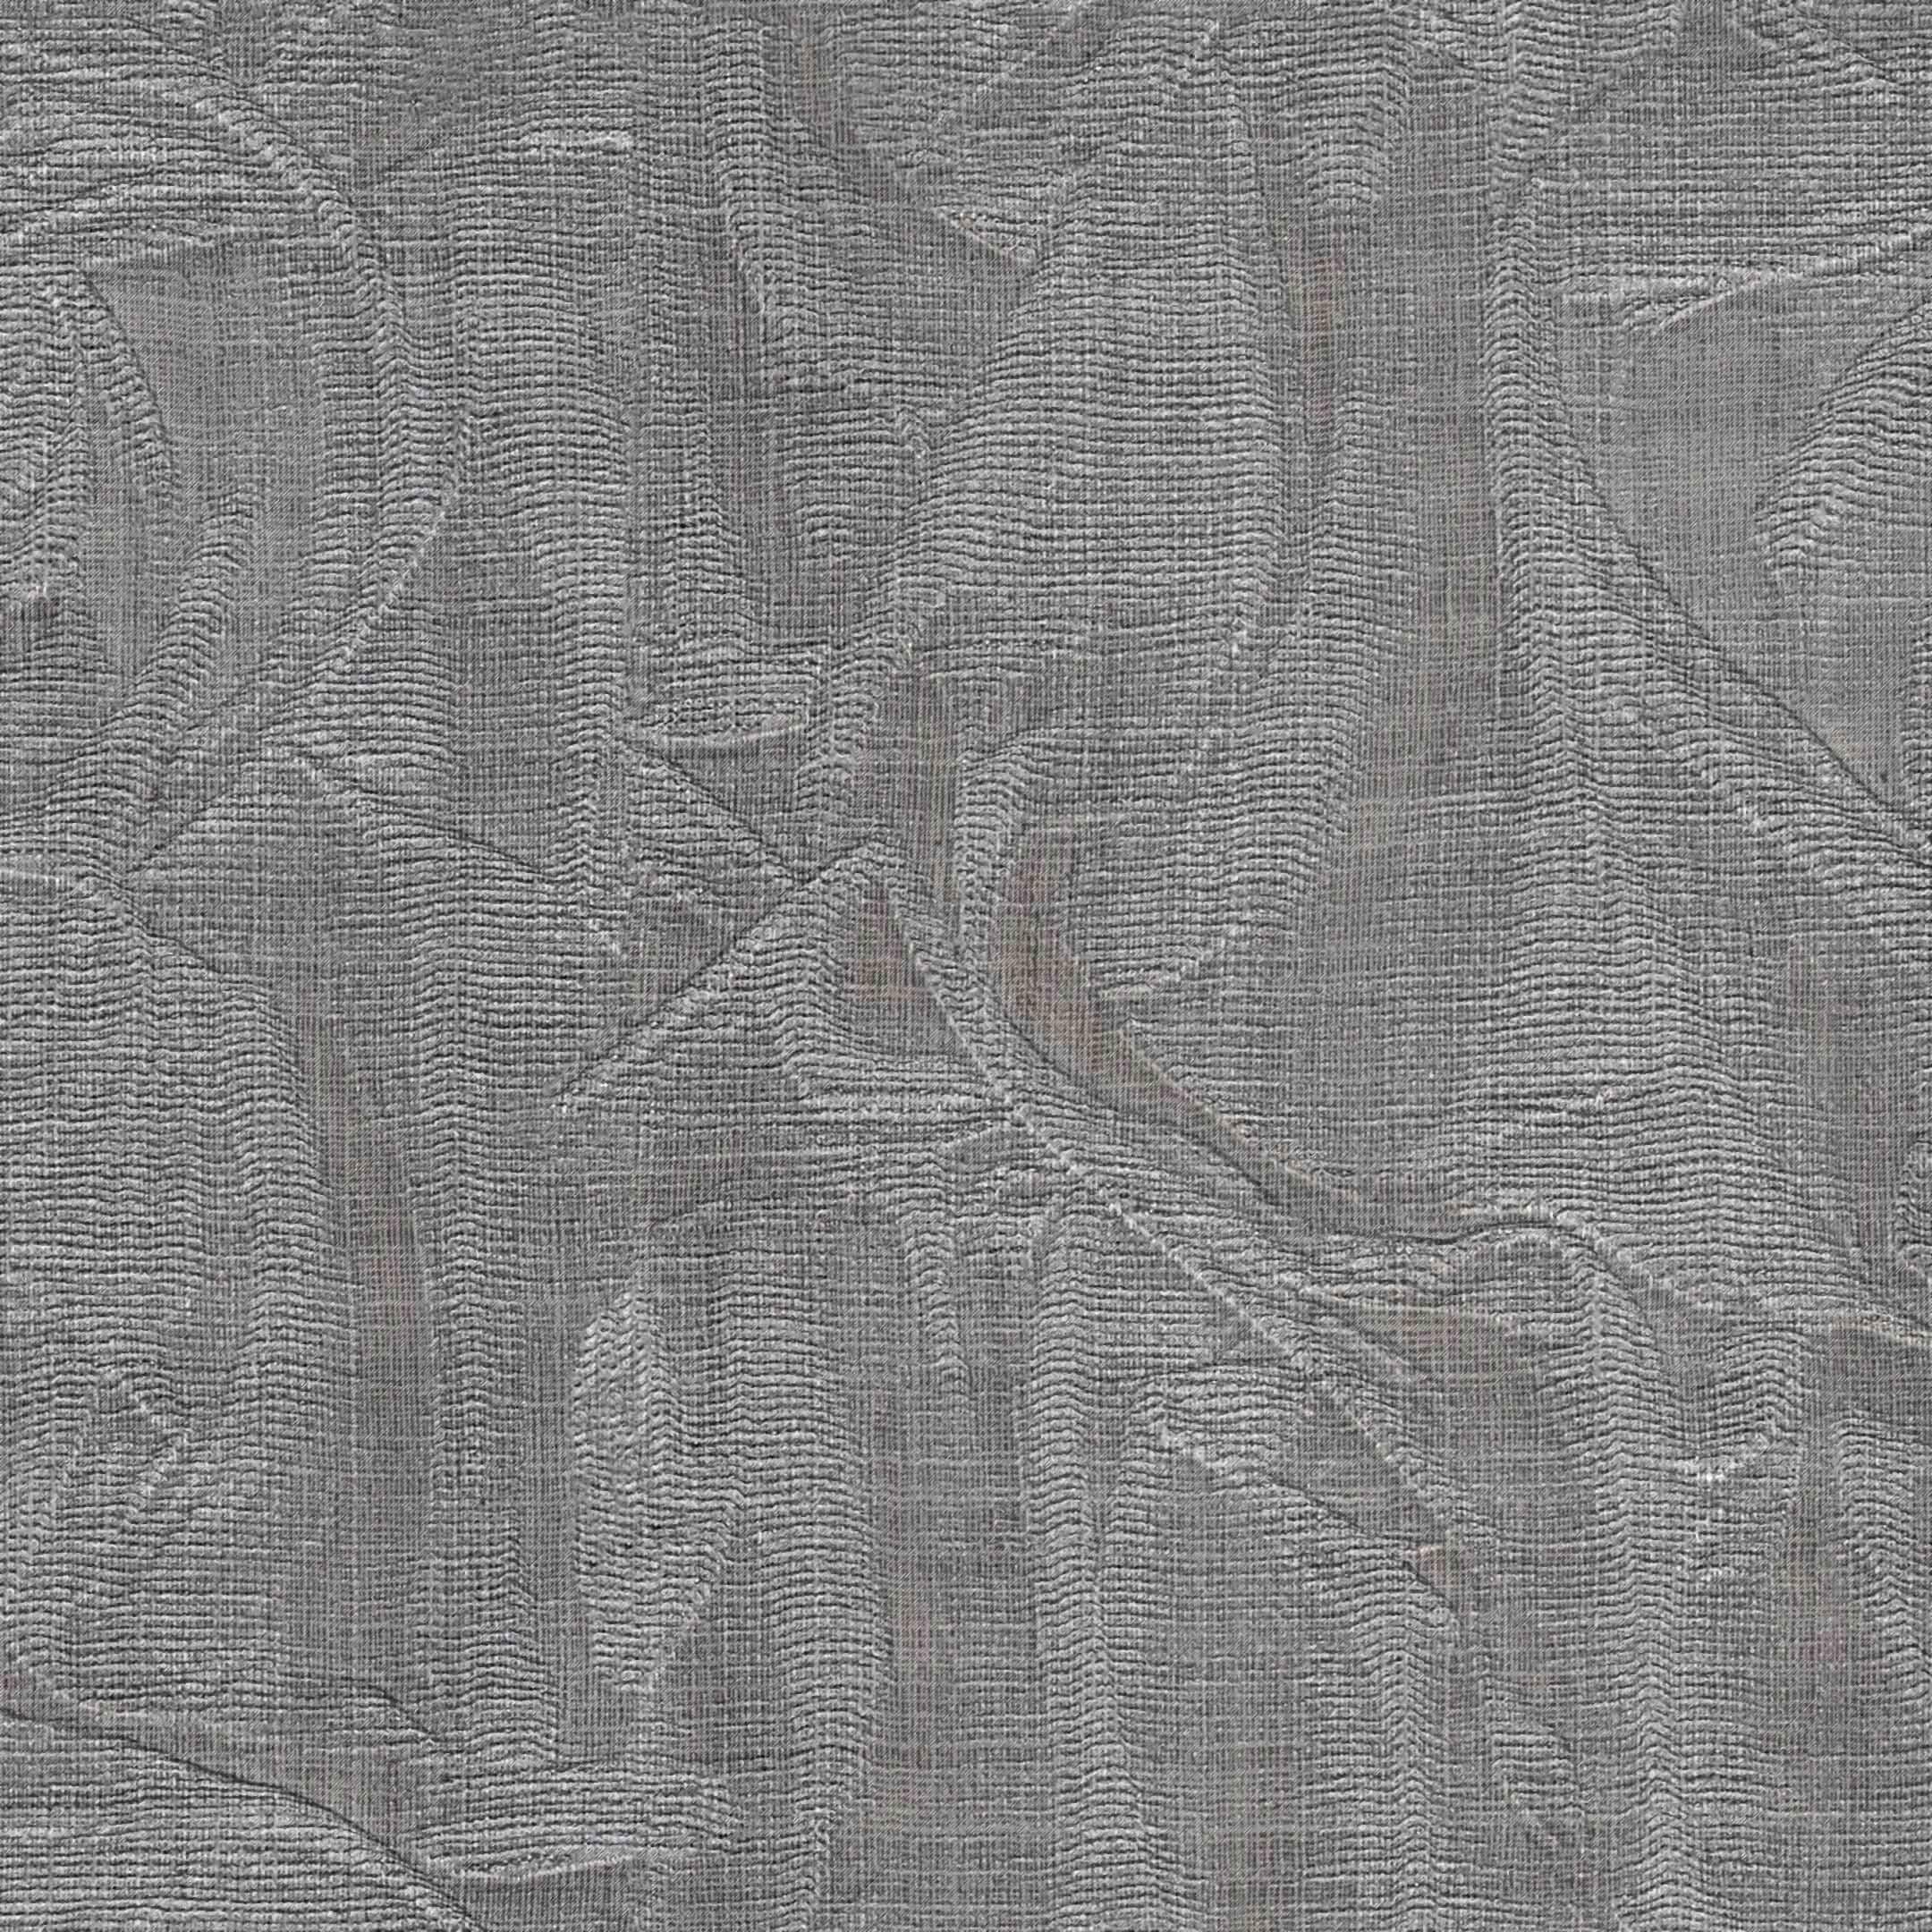 Обои виниловые на флизелиновой основе Zambaiti Murella Moda M53016 (1,06х10,05 м) цена